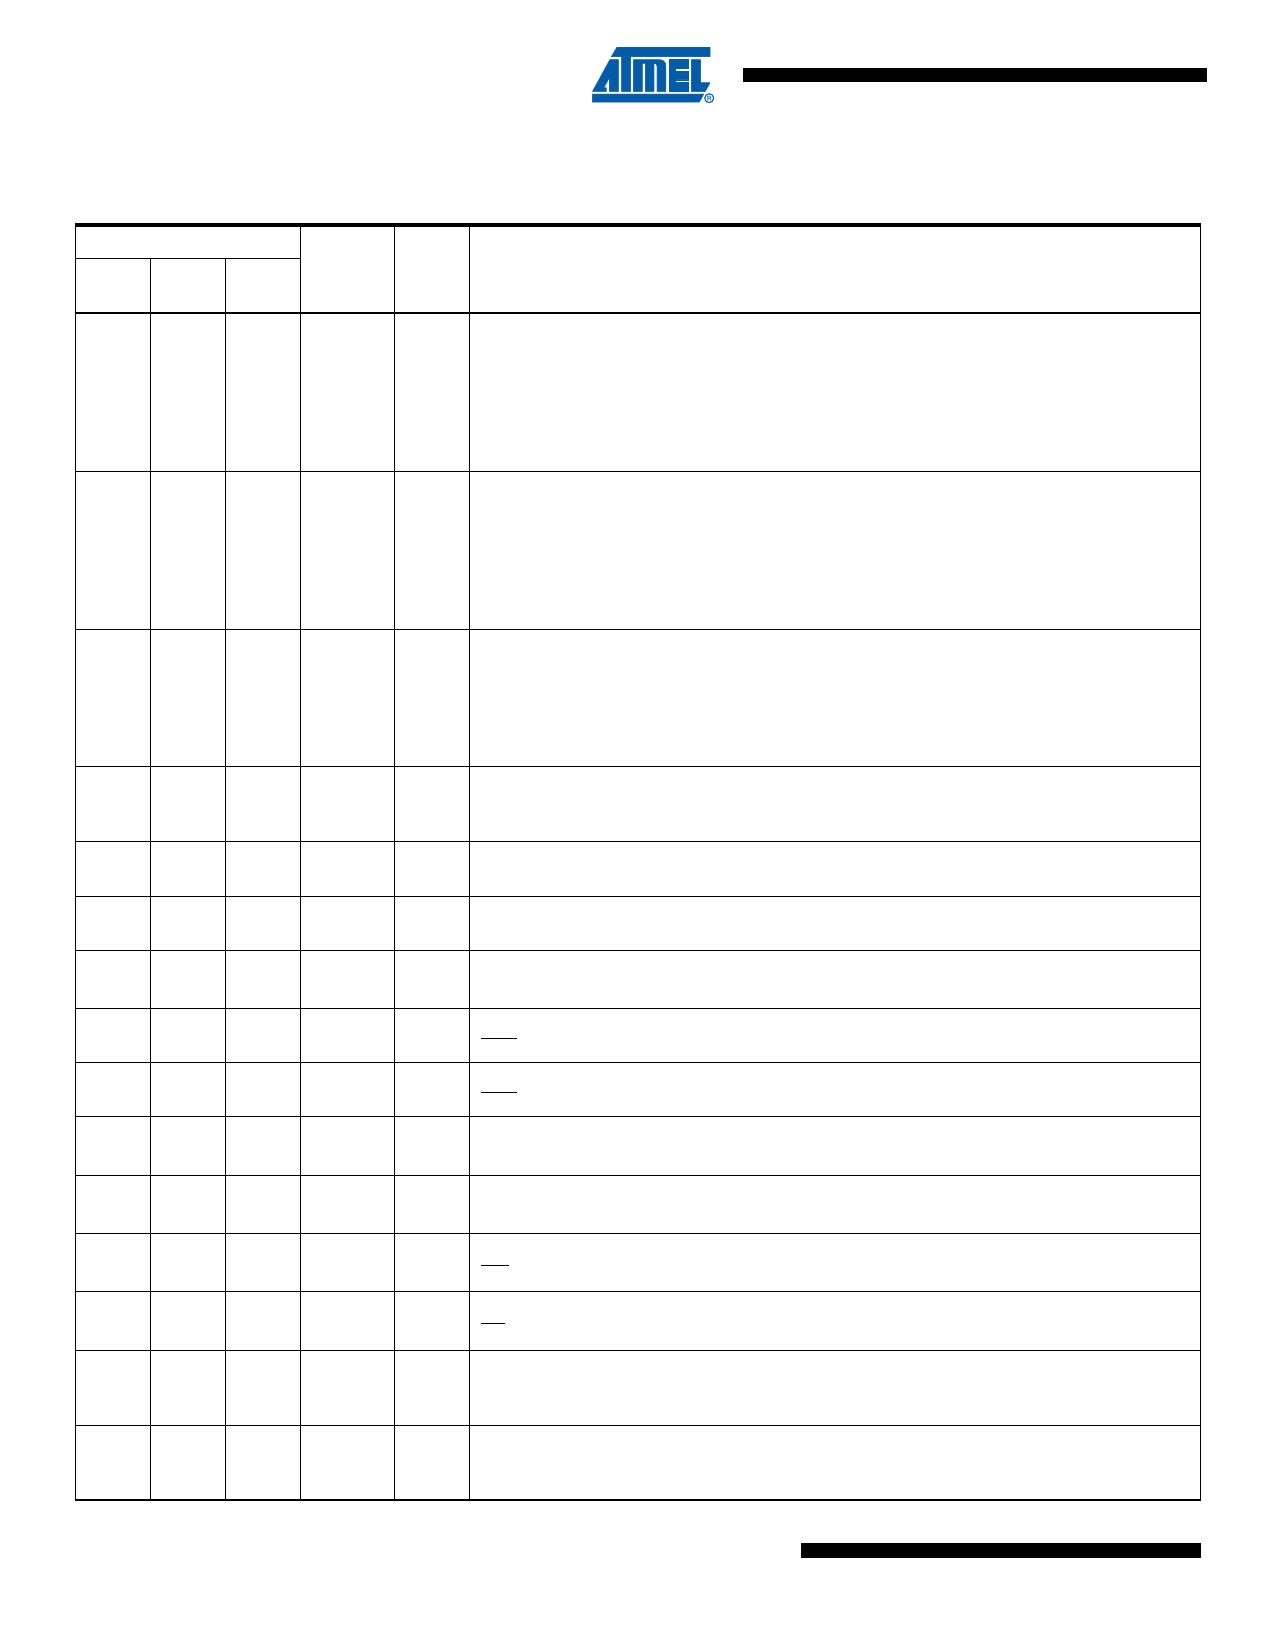 AT89LP51RC2 pdf, 반도체, 판매, 대치품